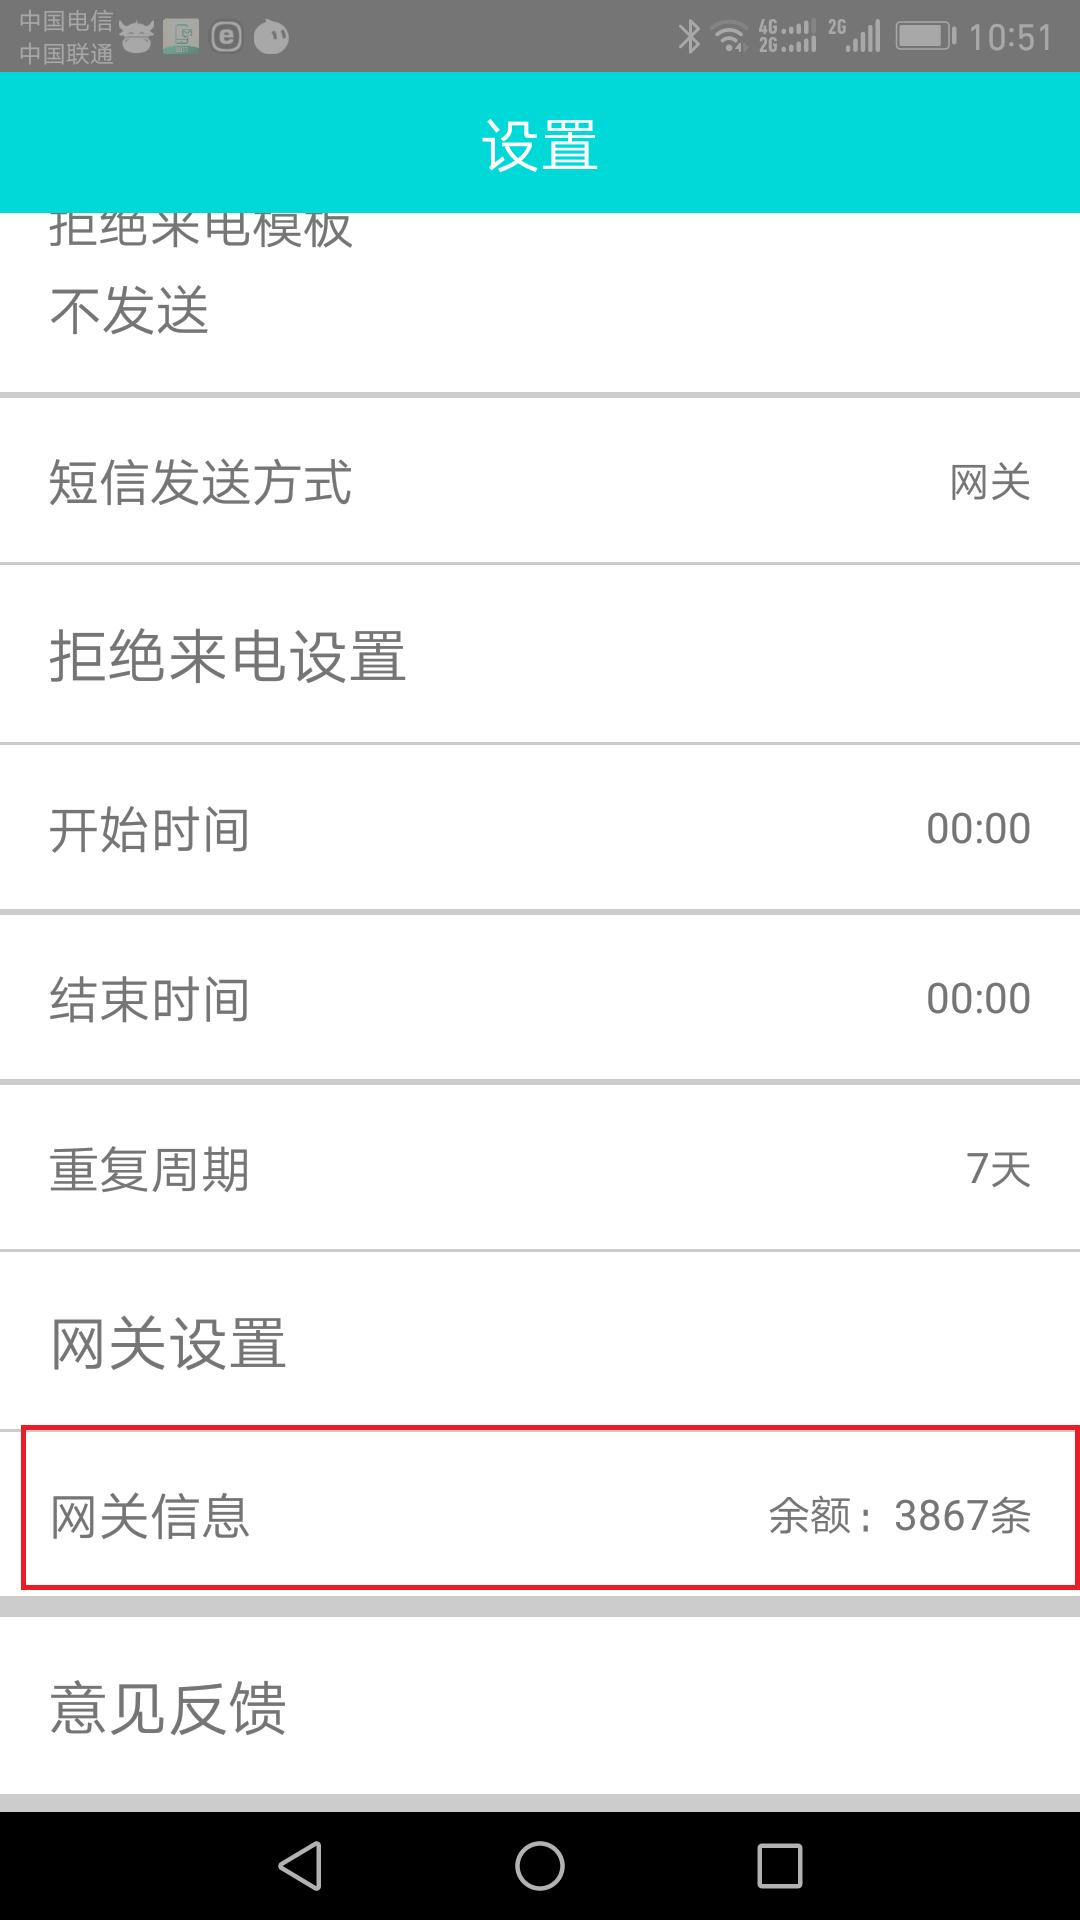 Screenshot_20170218-105107.png